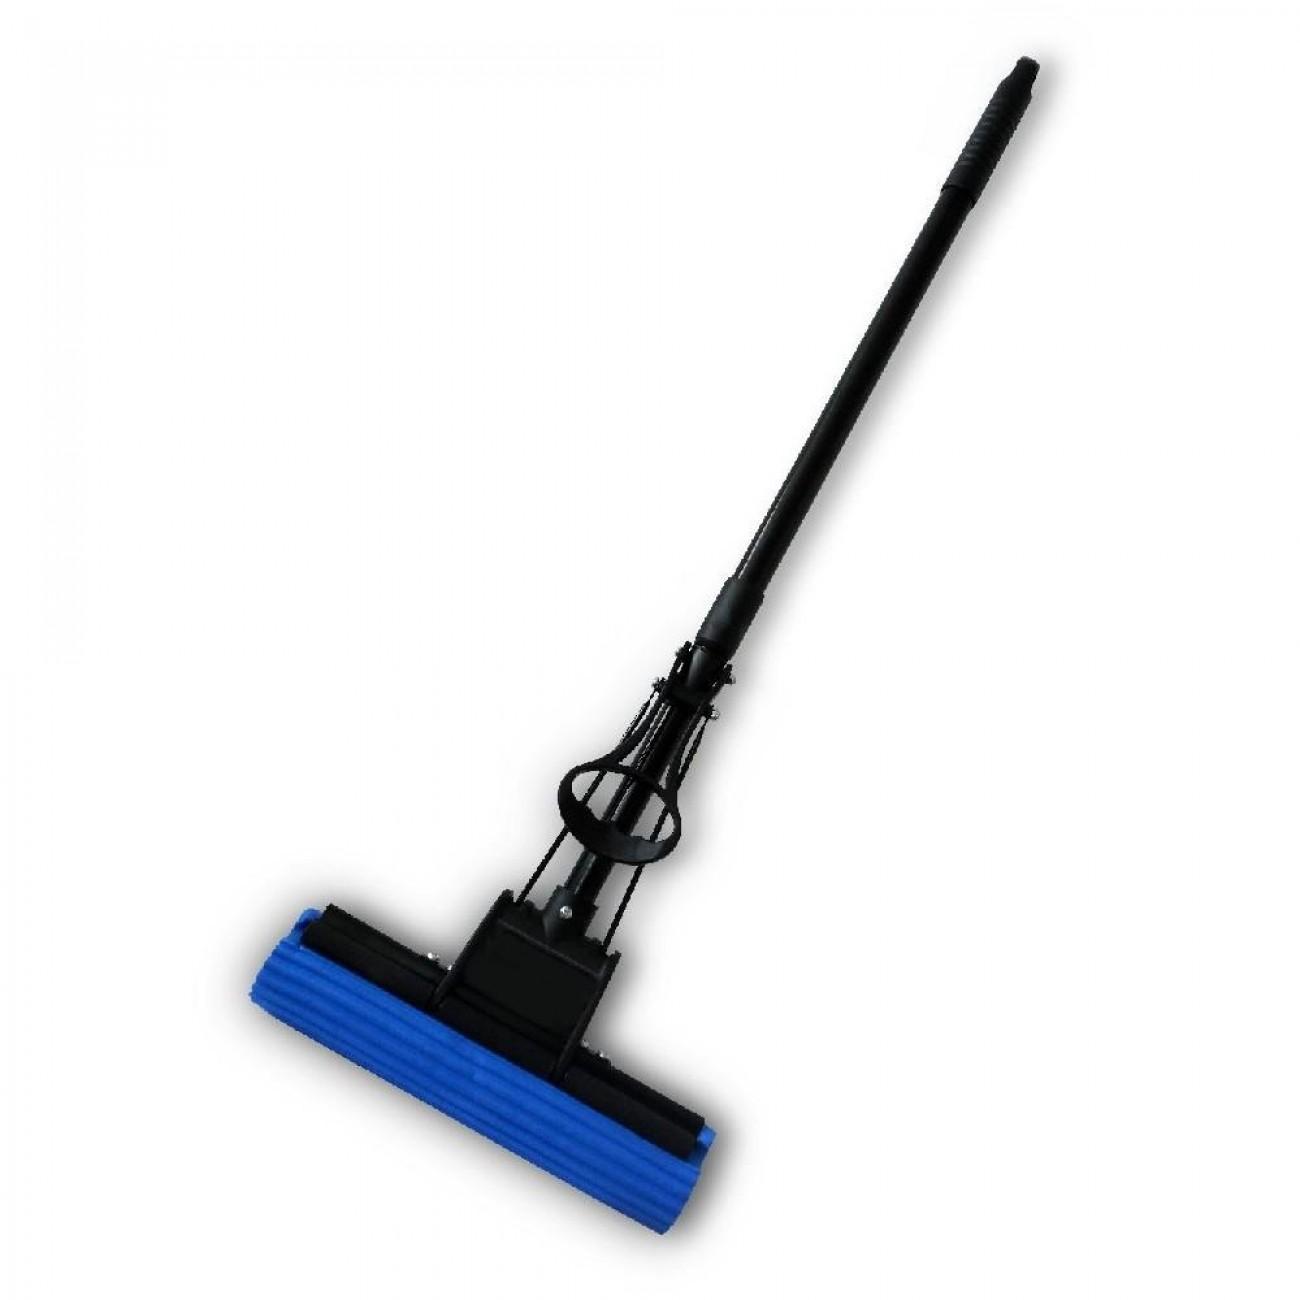 Подочистачка - моп ESPERANSA ES 1120 GN, 1.21 м в Подочистачки и мопове - ESPERANSA | Alleop